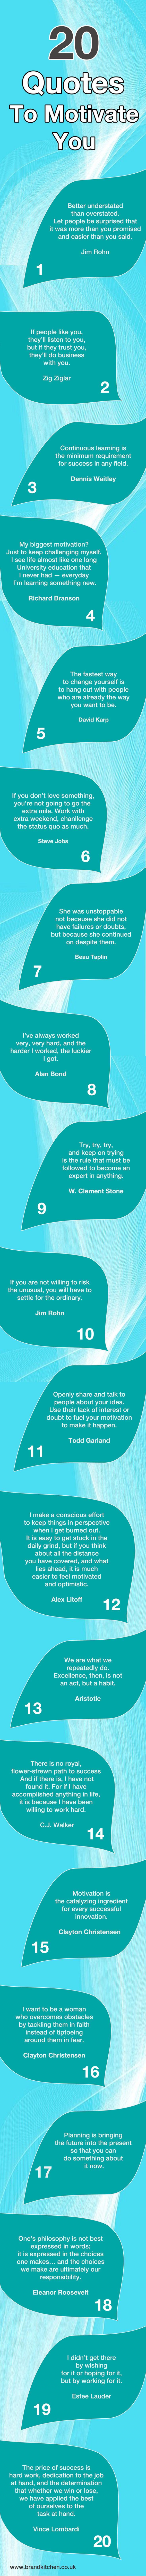 20 Quotes To Motivate You #quotes #motivational #infograpics #entrepreneurs #mumpreneurs